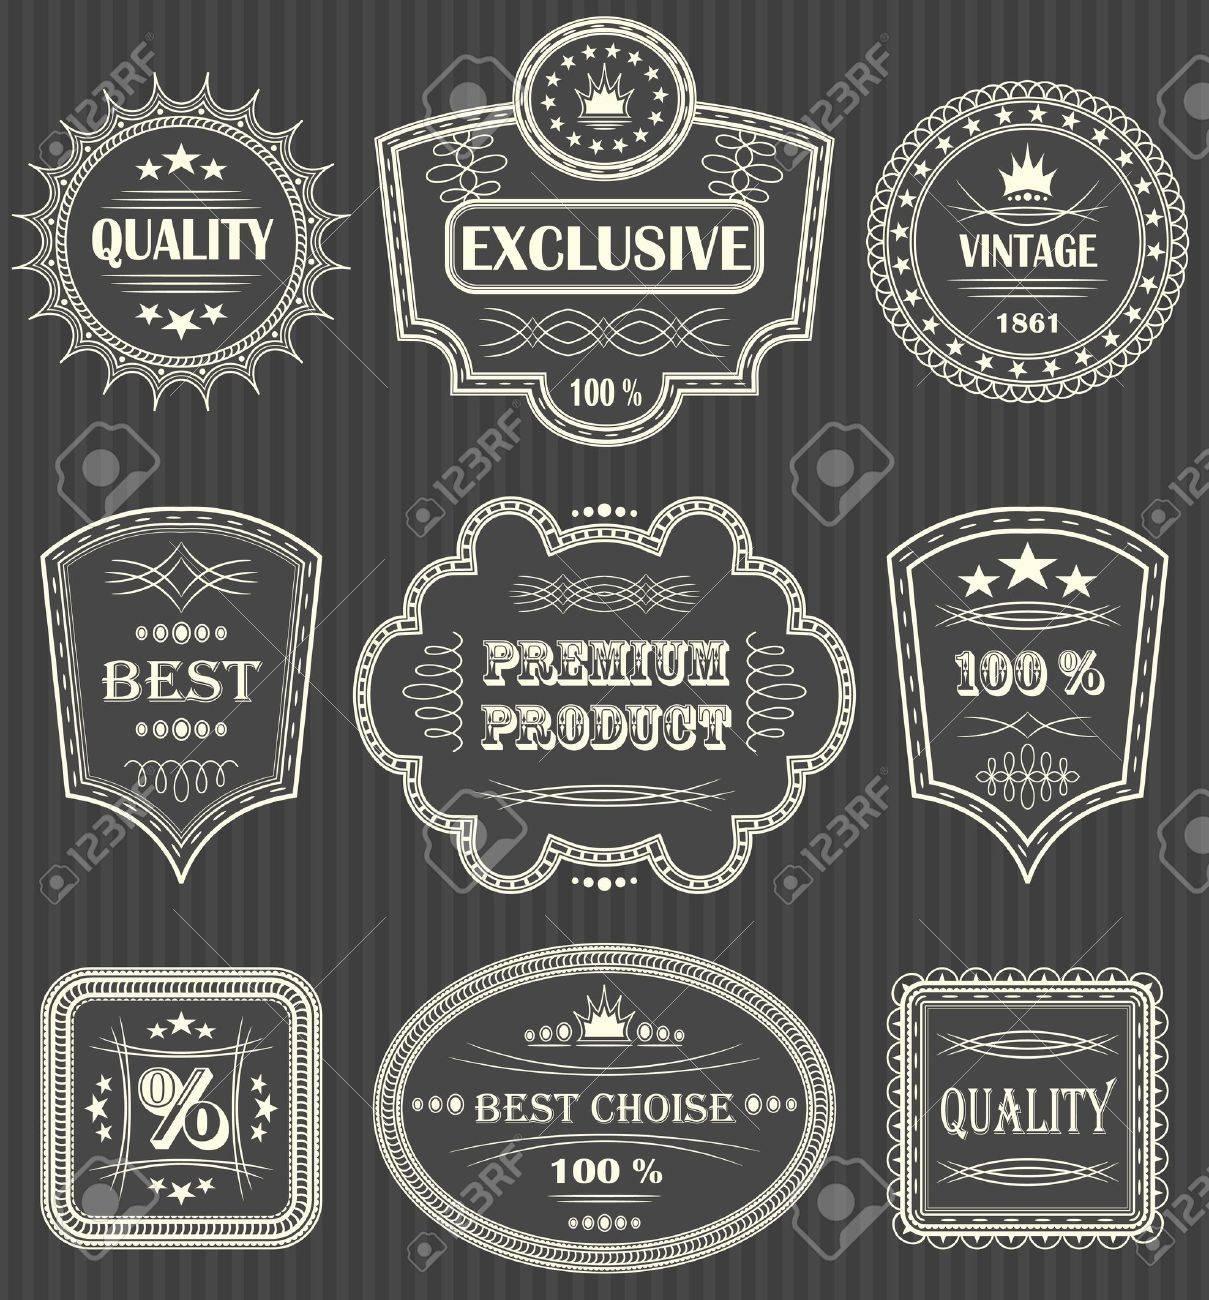 Vintage labels. Striped background Stock Vector - 14668668